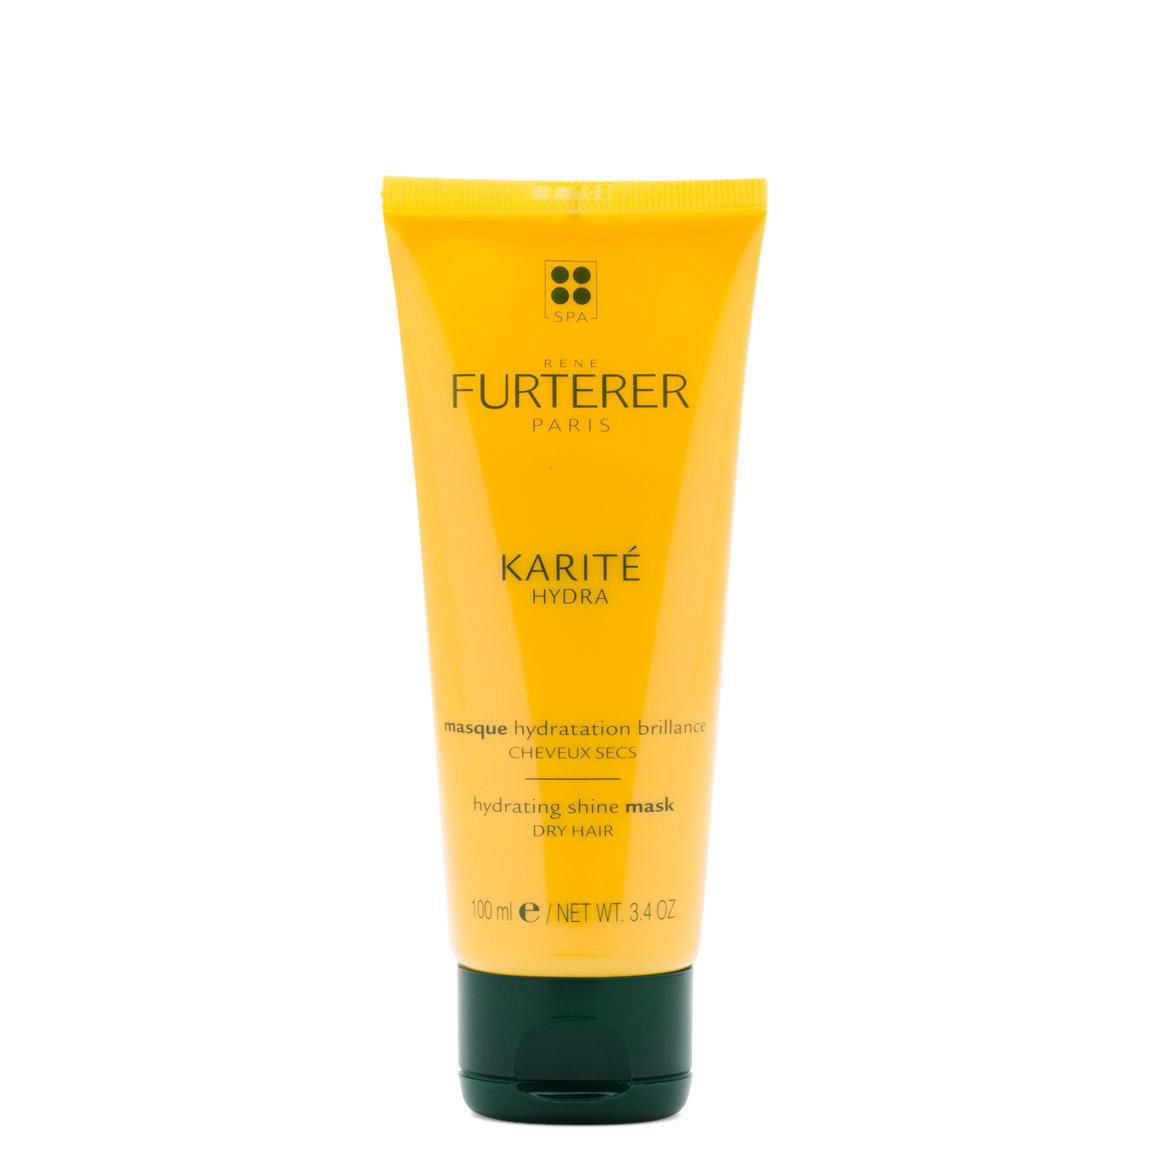 Rene Furterer Karite Hydra Hydrating Shine Mask 3.4 oz product swatch.